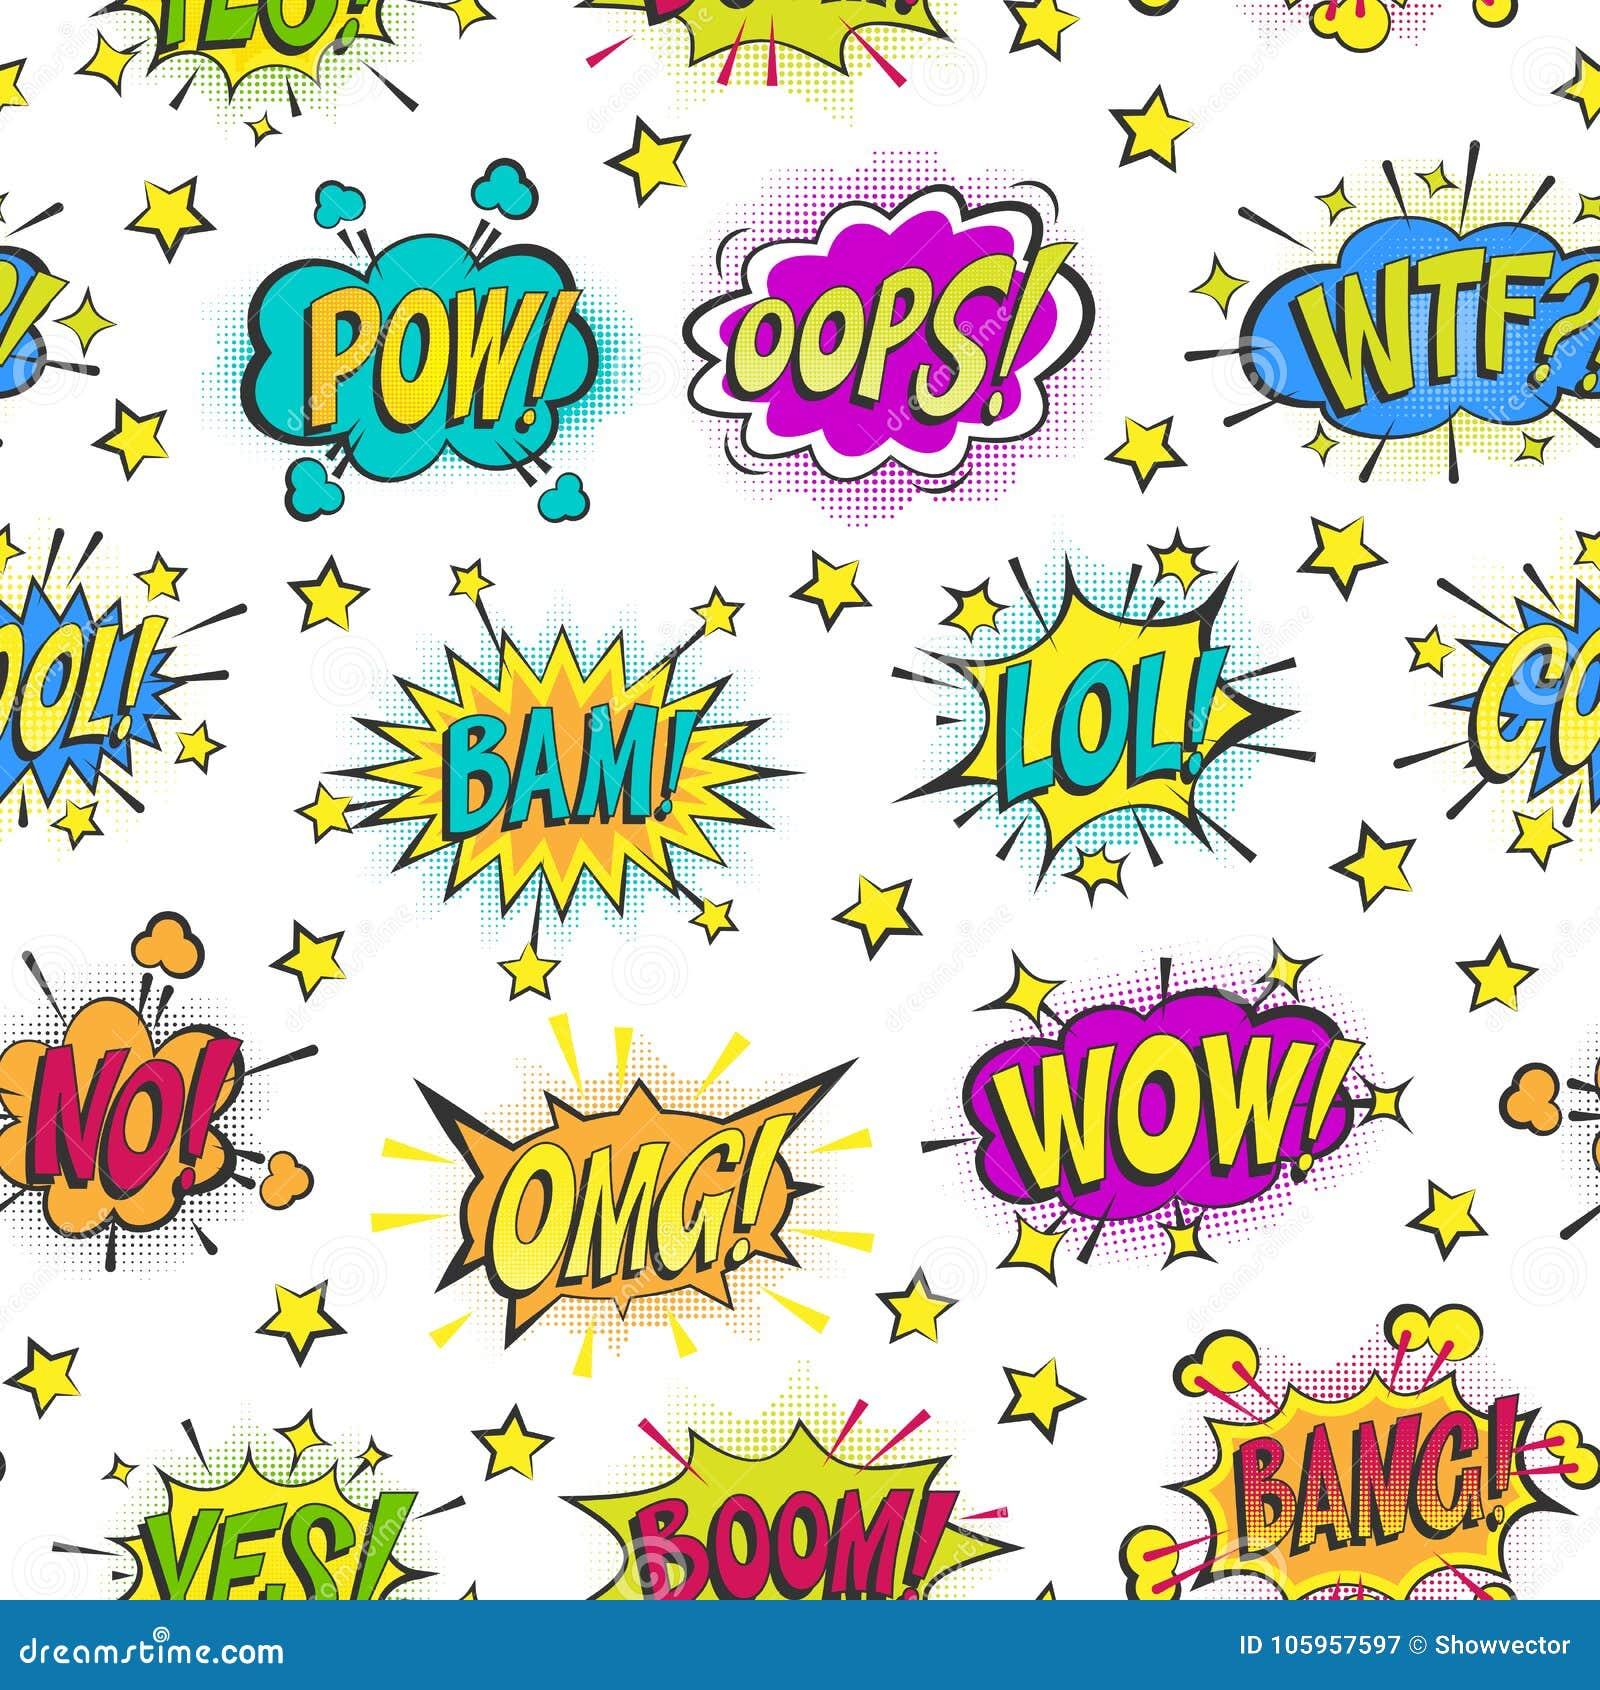 Komische Blasen der Pop-Art vector sprudelnde der bunten asrtistic Comicsformen Sprachewolke Karikatur popart Ballons an